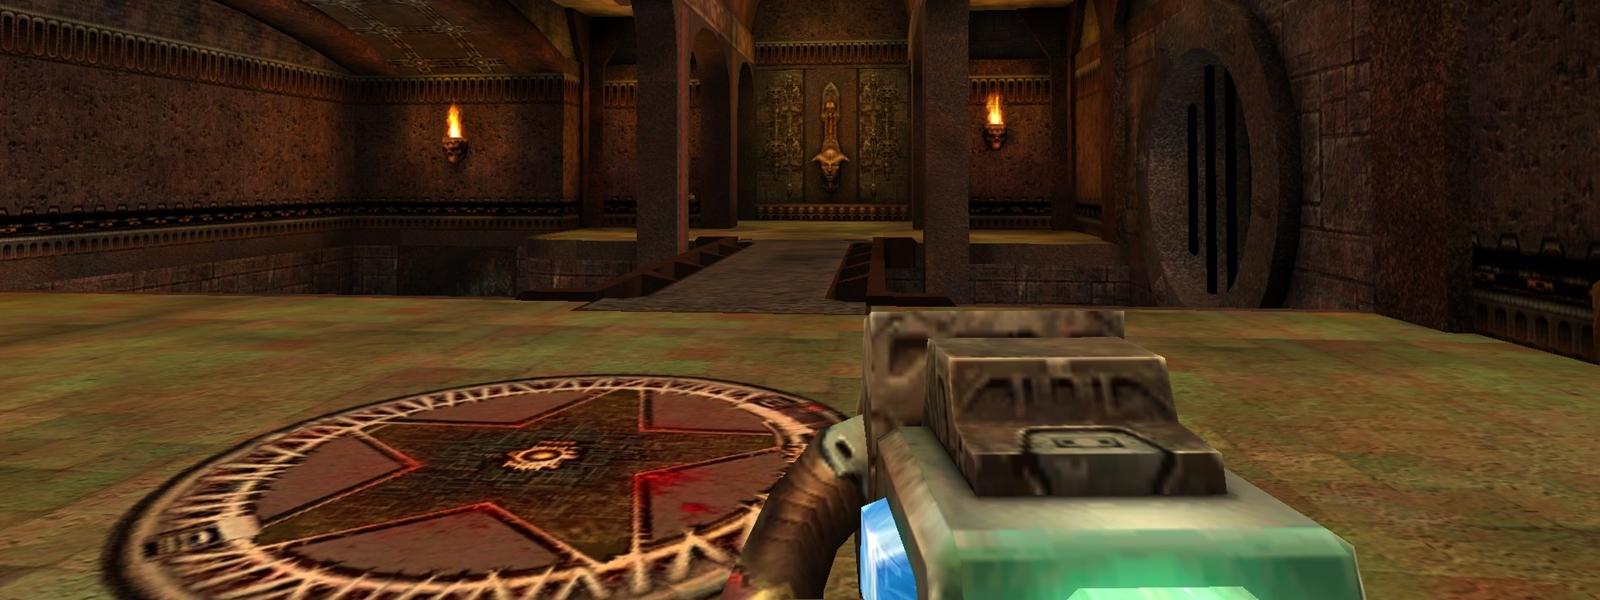 Quake 1 game download torrent